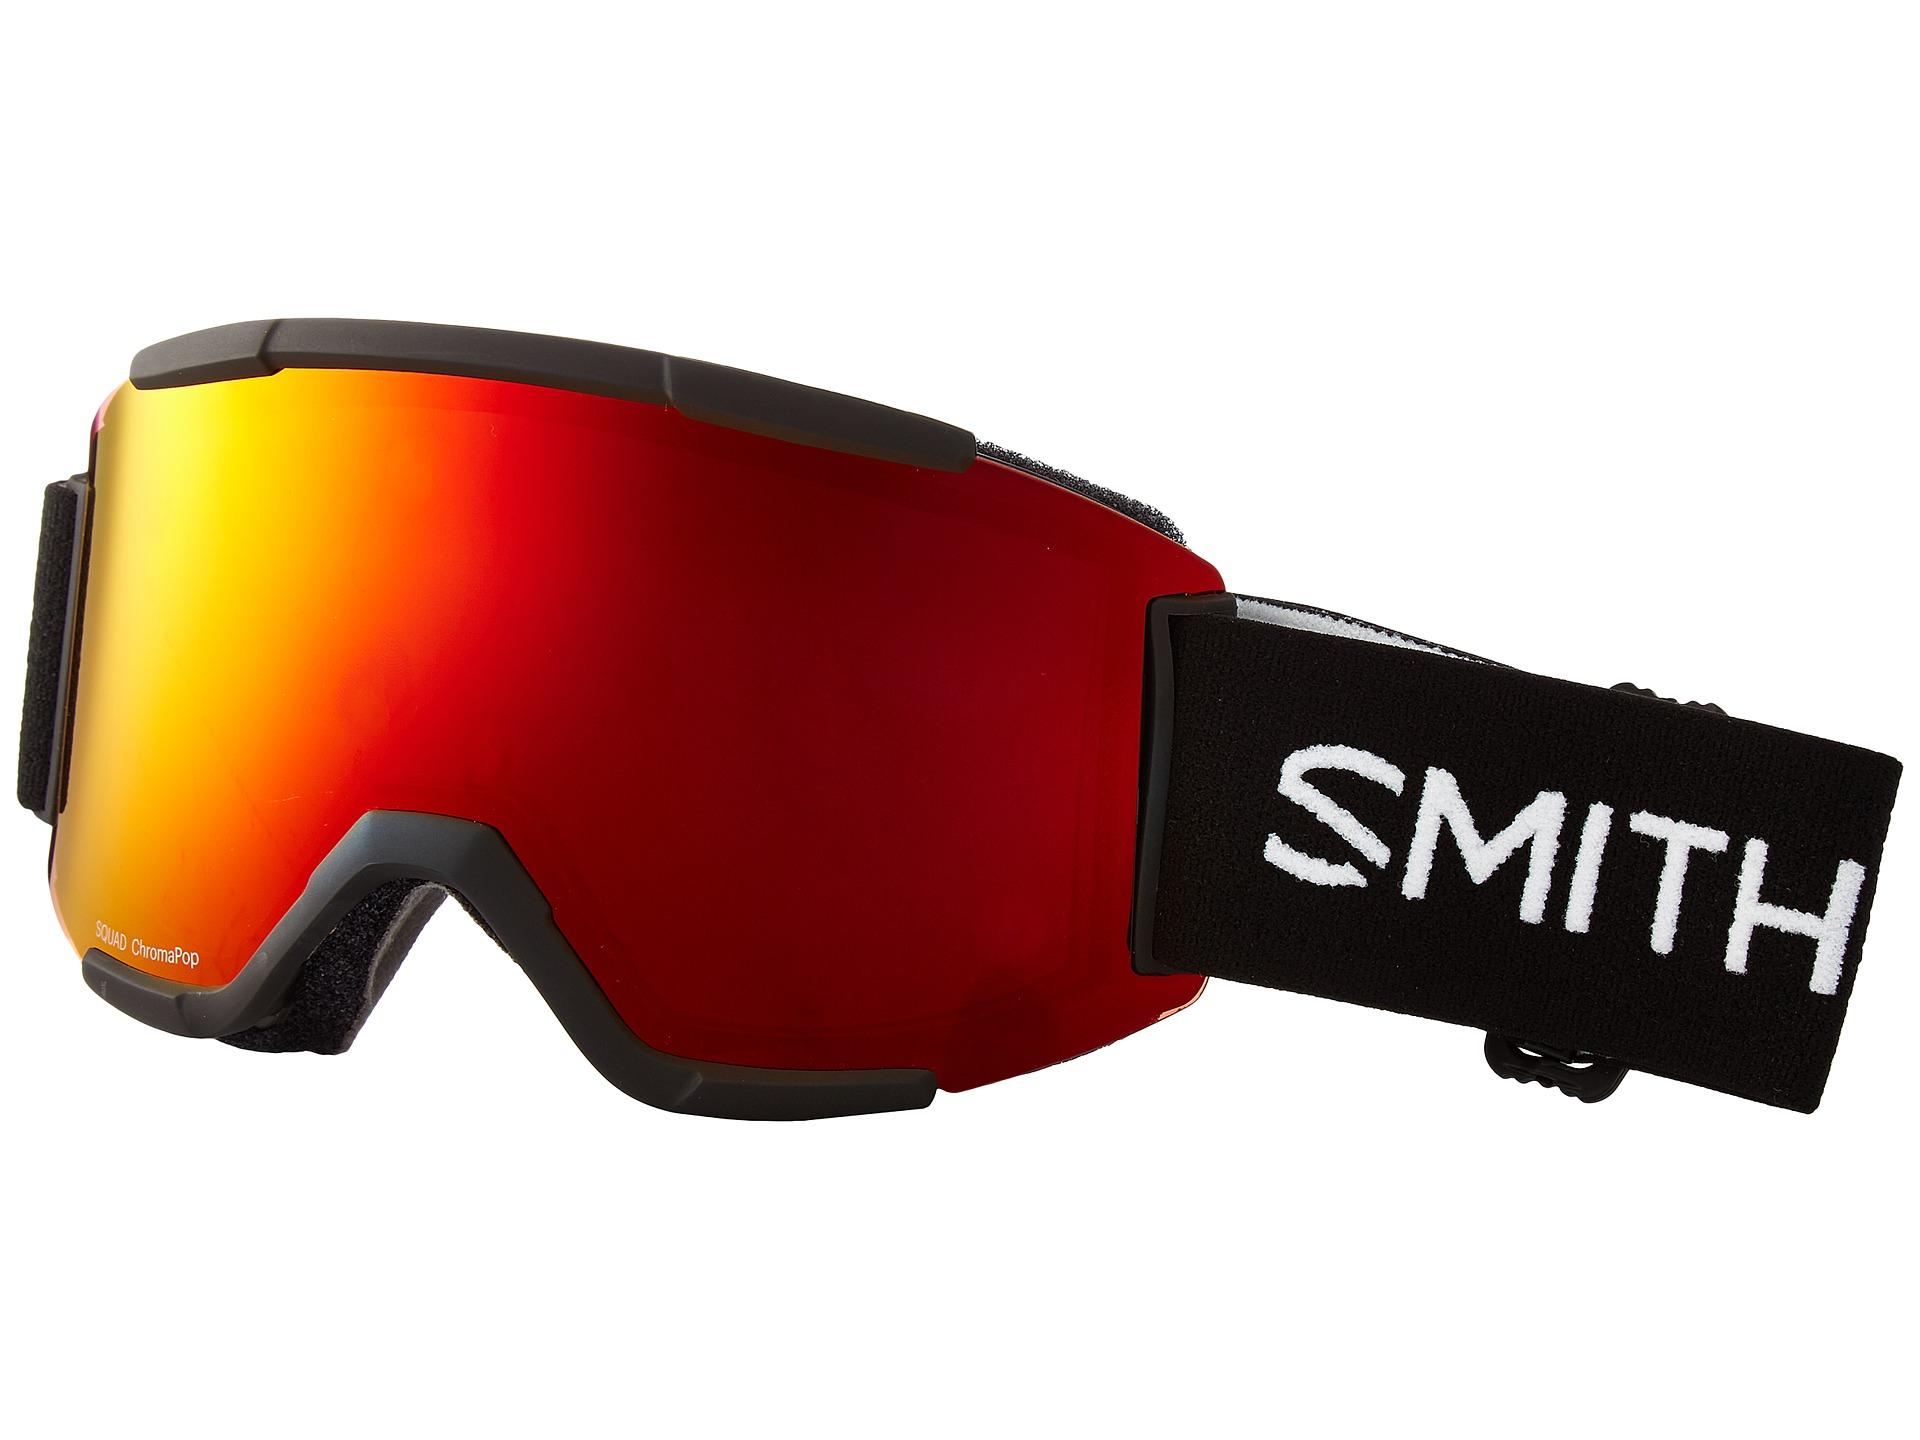 7d84dbca74 Smith Optics Squad Goggle Black Frame Chromapop Everyday Yellow Lens -  www.cinemas93